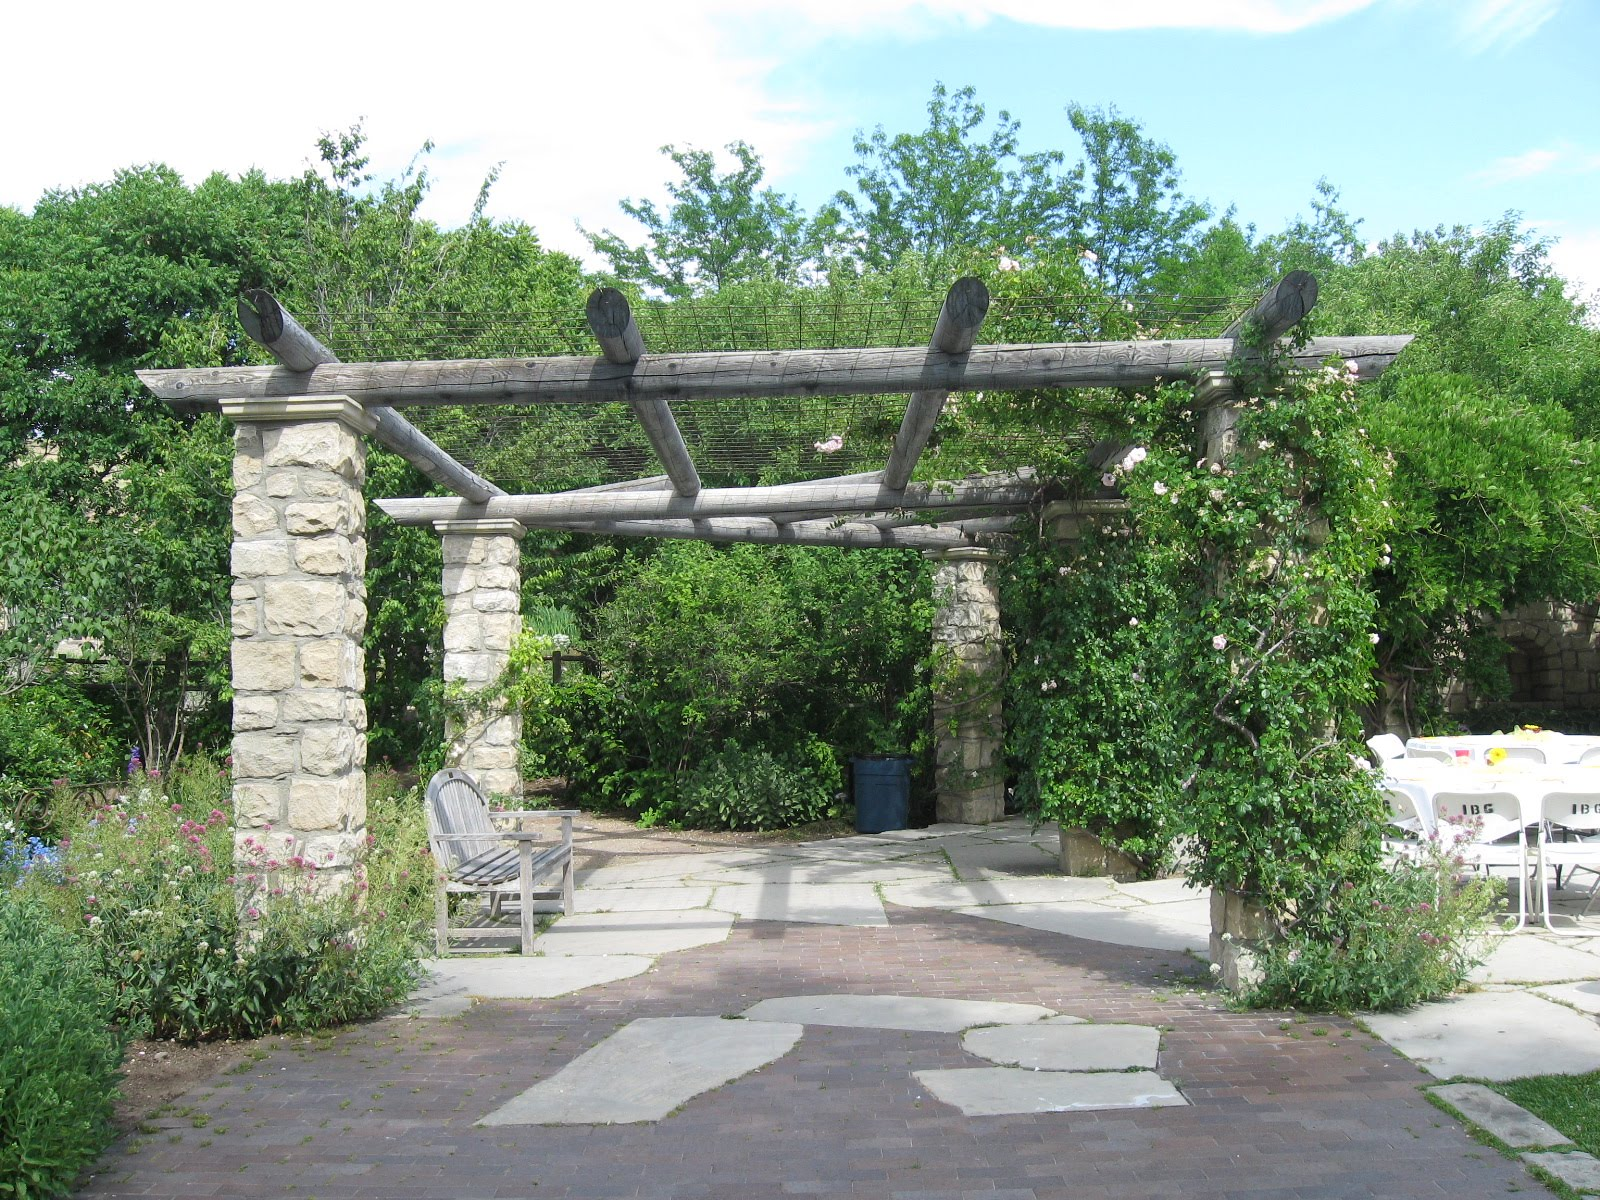 Saltbox Treasures The Idaho Botanical Garden In Boise Idaho